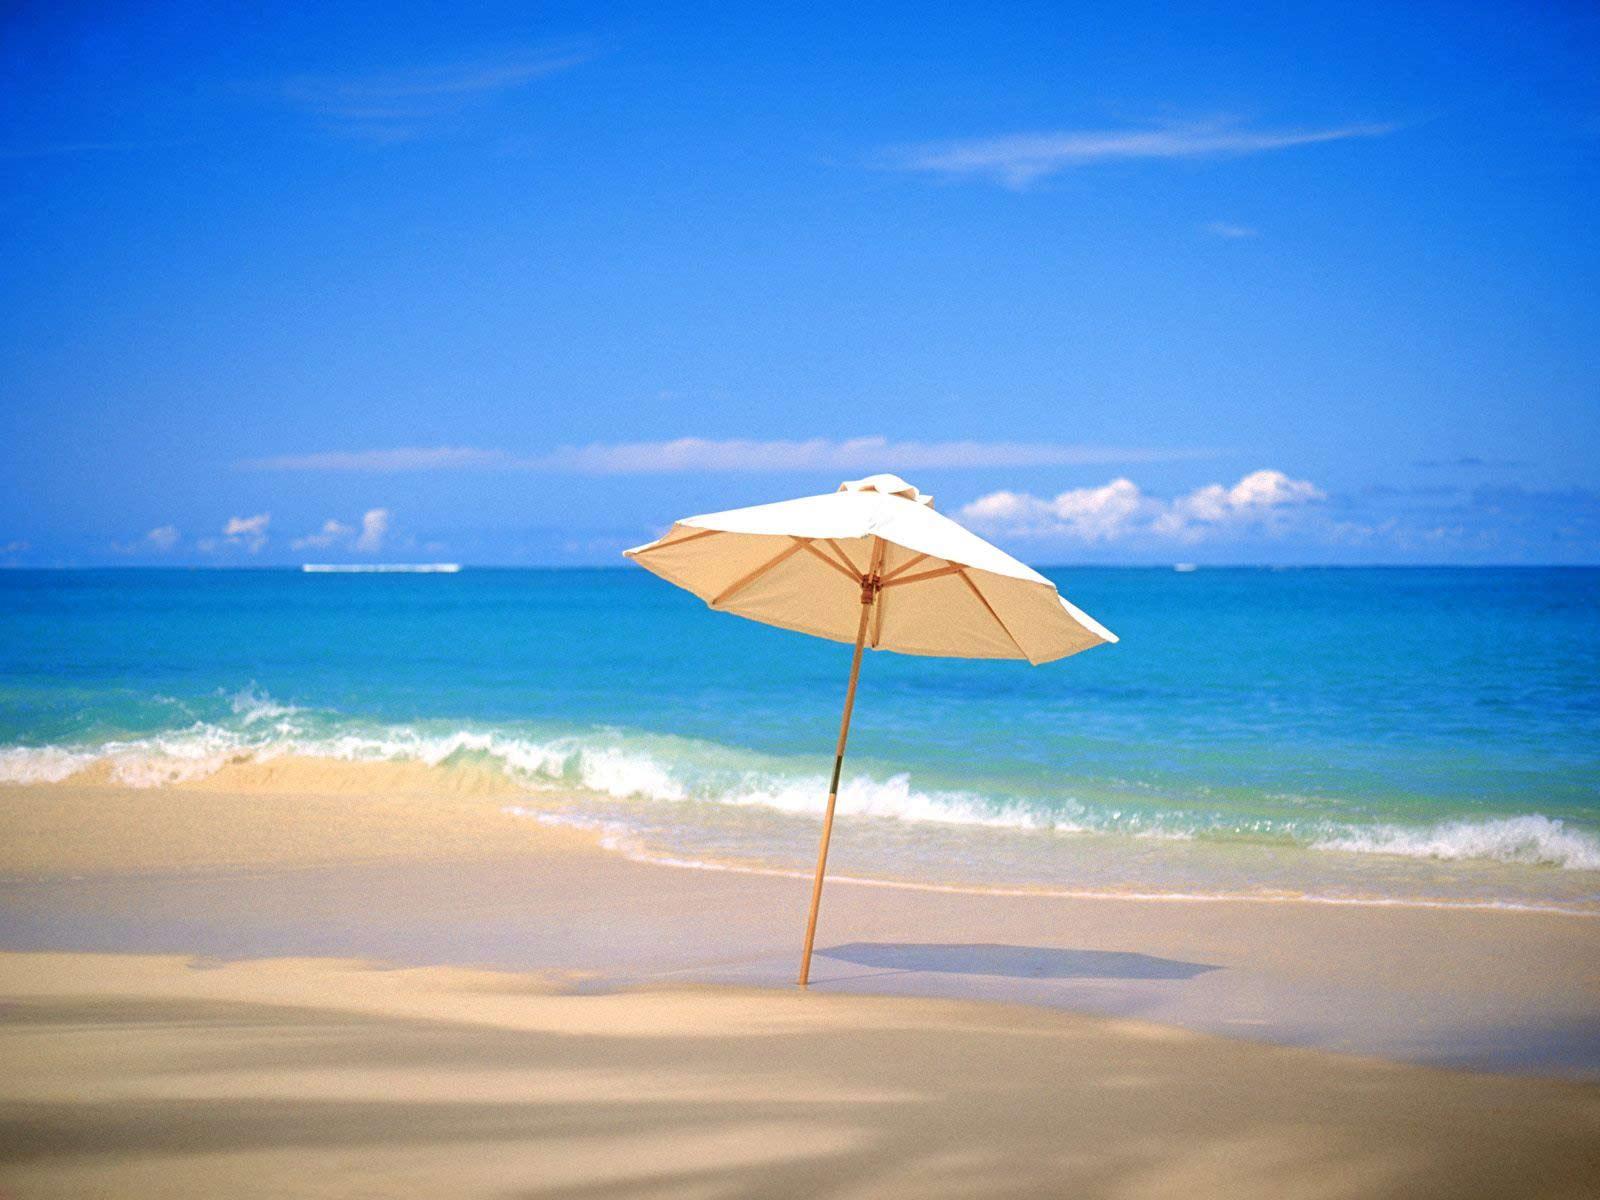 http://1.bp.blogspot.com/-su1hinSyFrs/TgmS2HAdtrI/AAAAAAAABFs/kzD21RYk-AU/s1600/Vacanze+estive+disservizi+++fallimenti.jpg